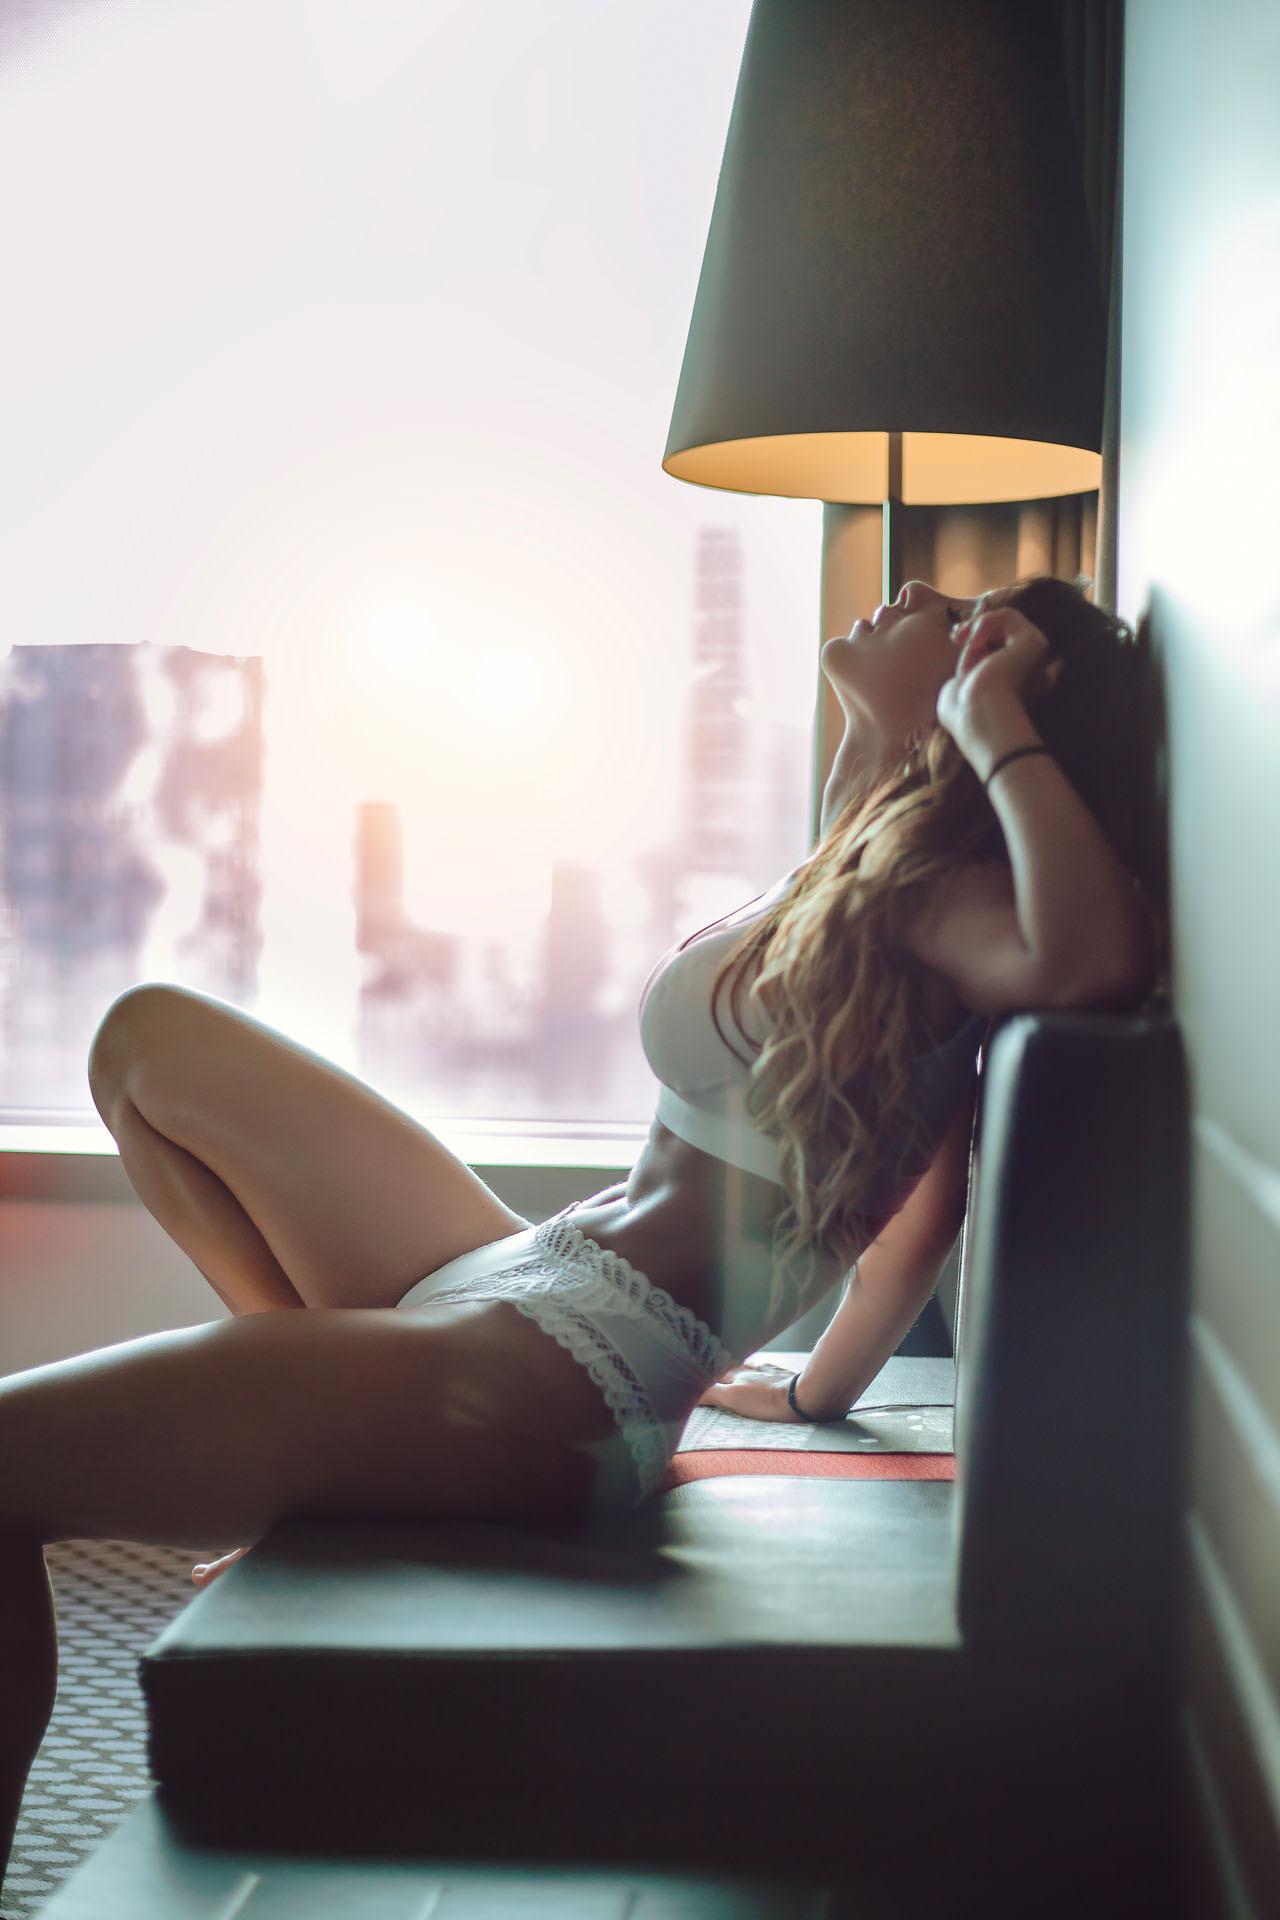 2017-01-20 - Melyna - Hotel Melia - 1045 - 1920px